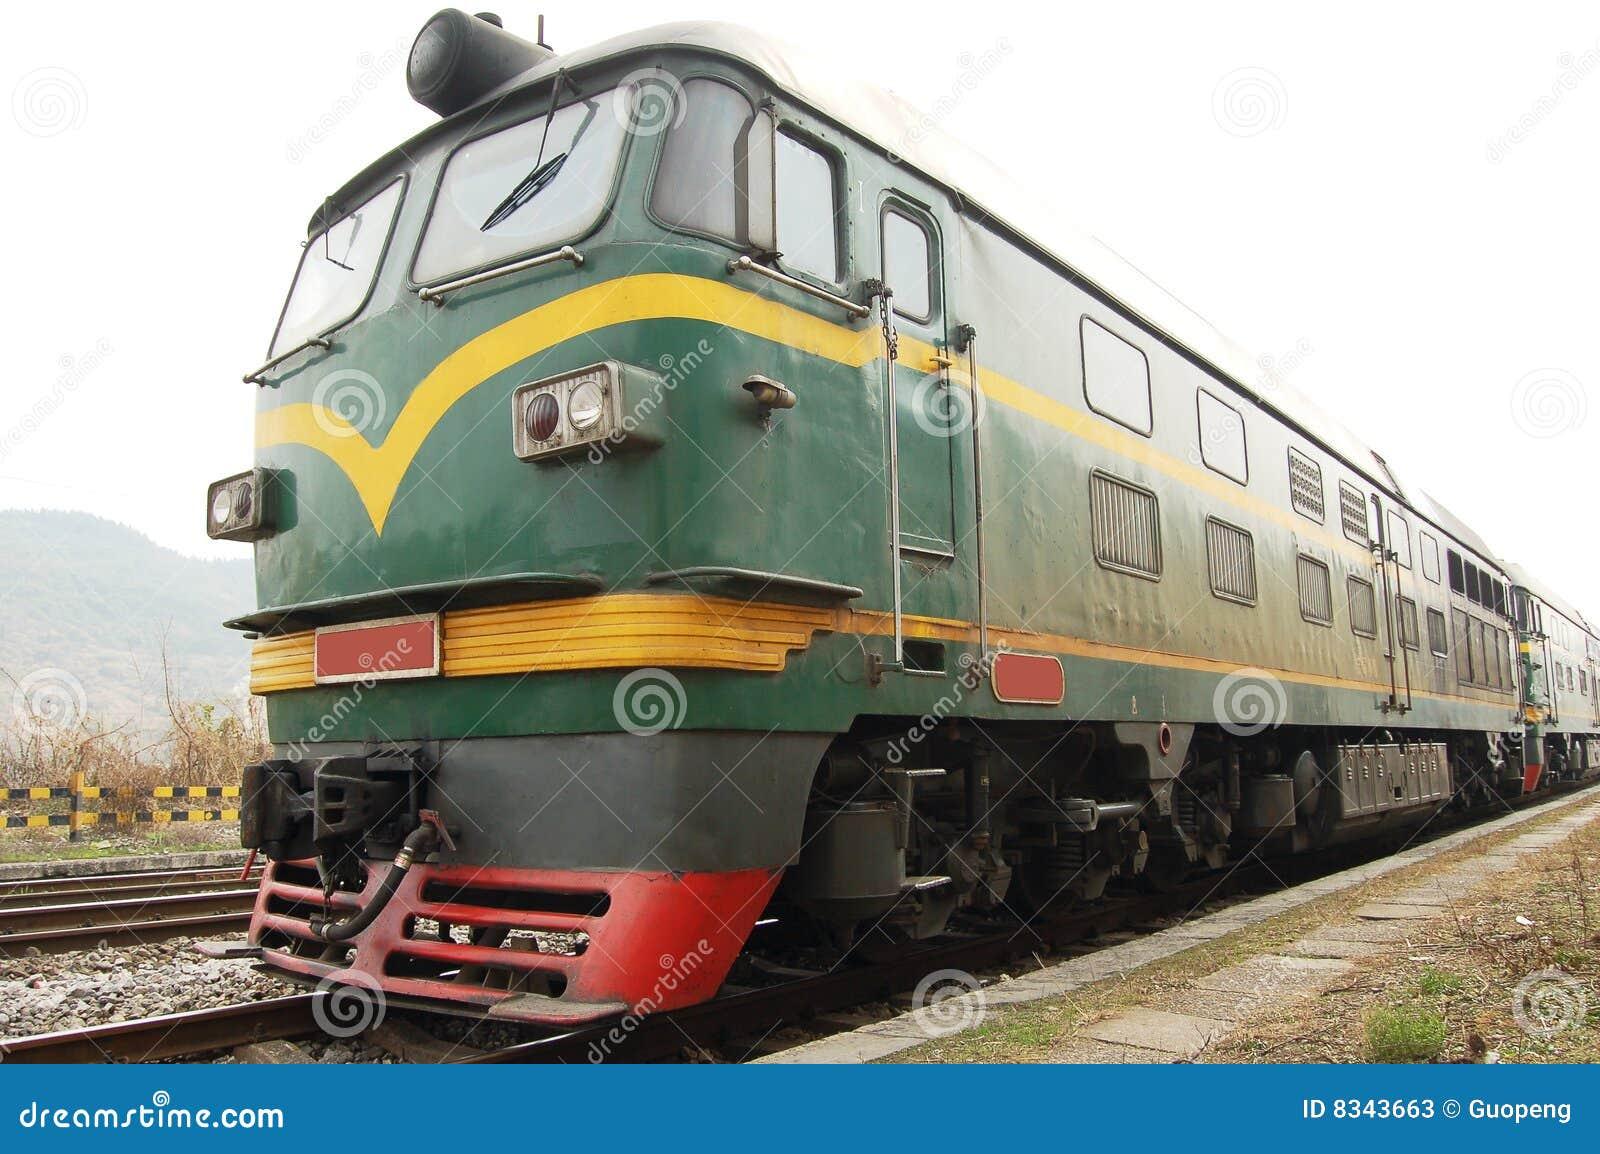 Motor train stock image  Image of iron, goods, power, transport